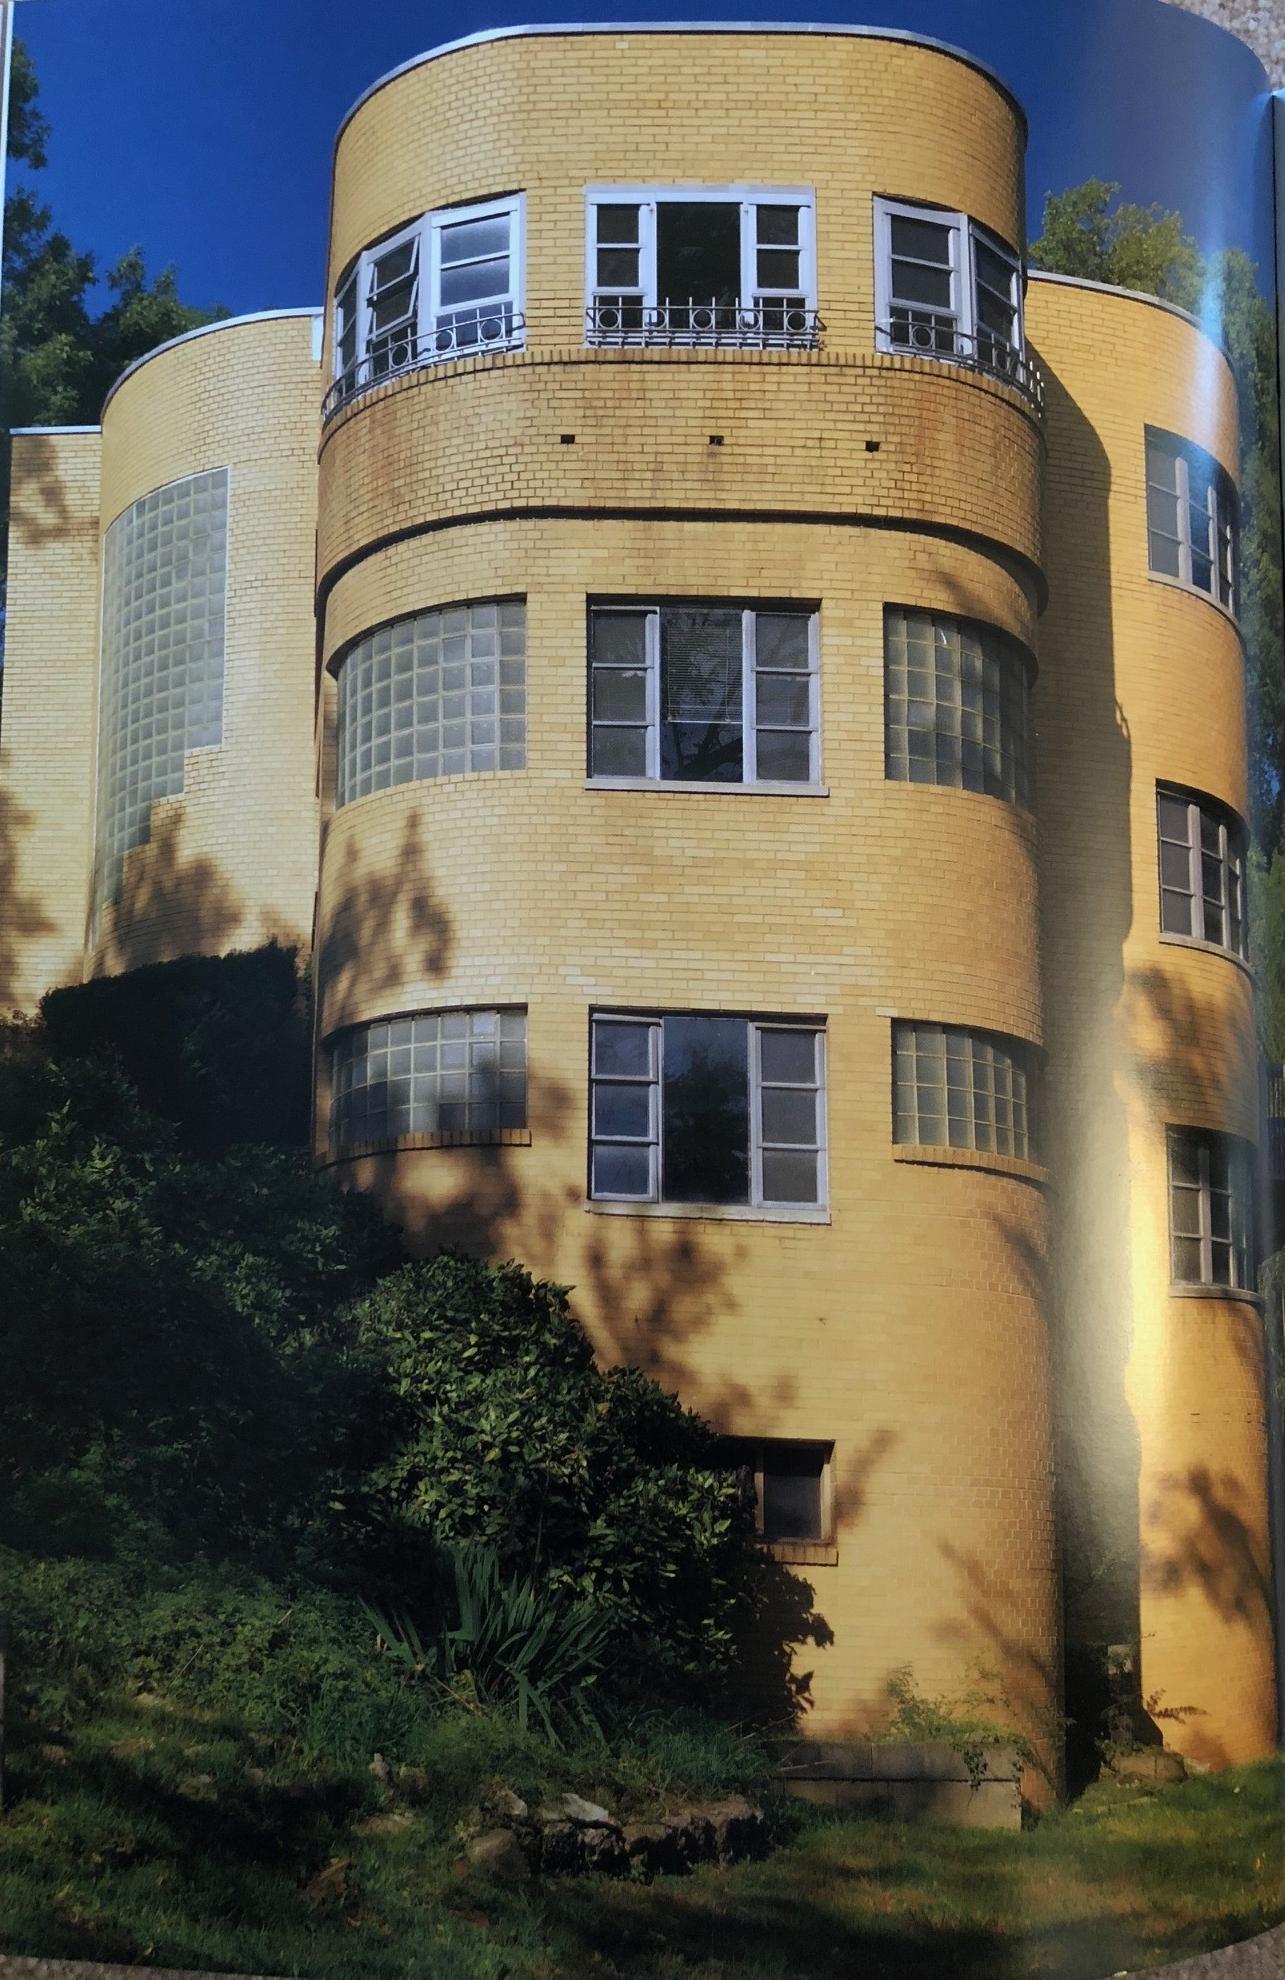 Mounsey House, back